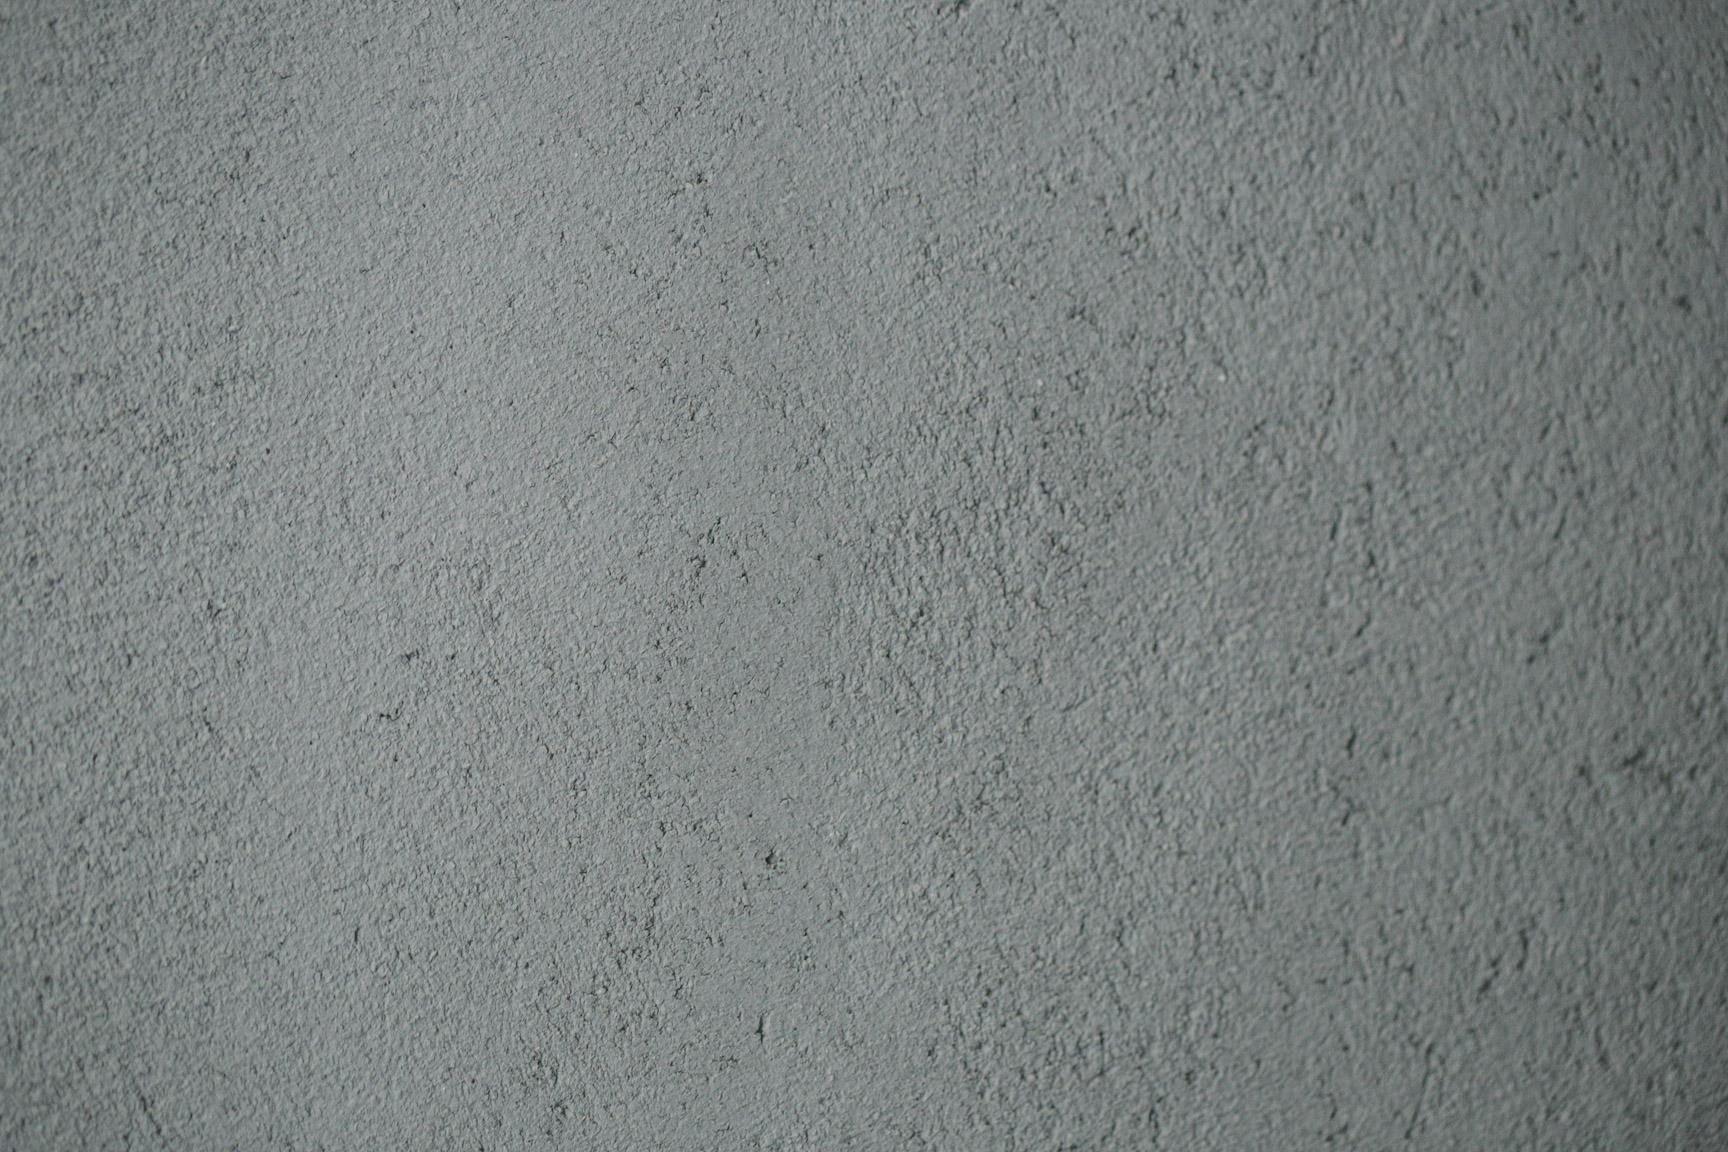 surfacedesign-16.jpg